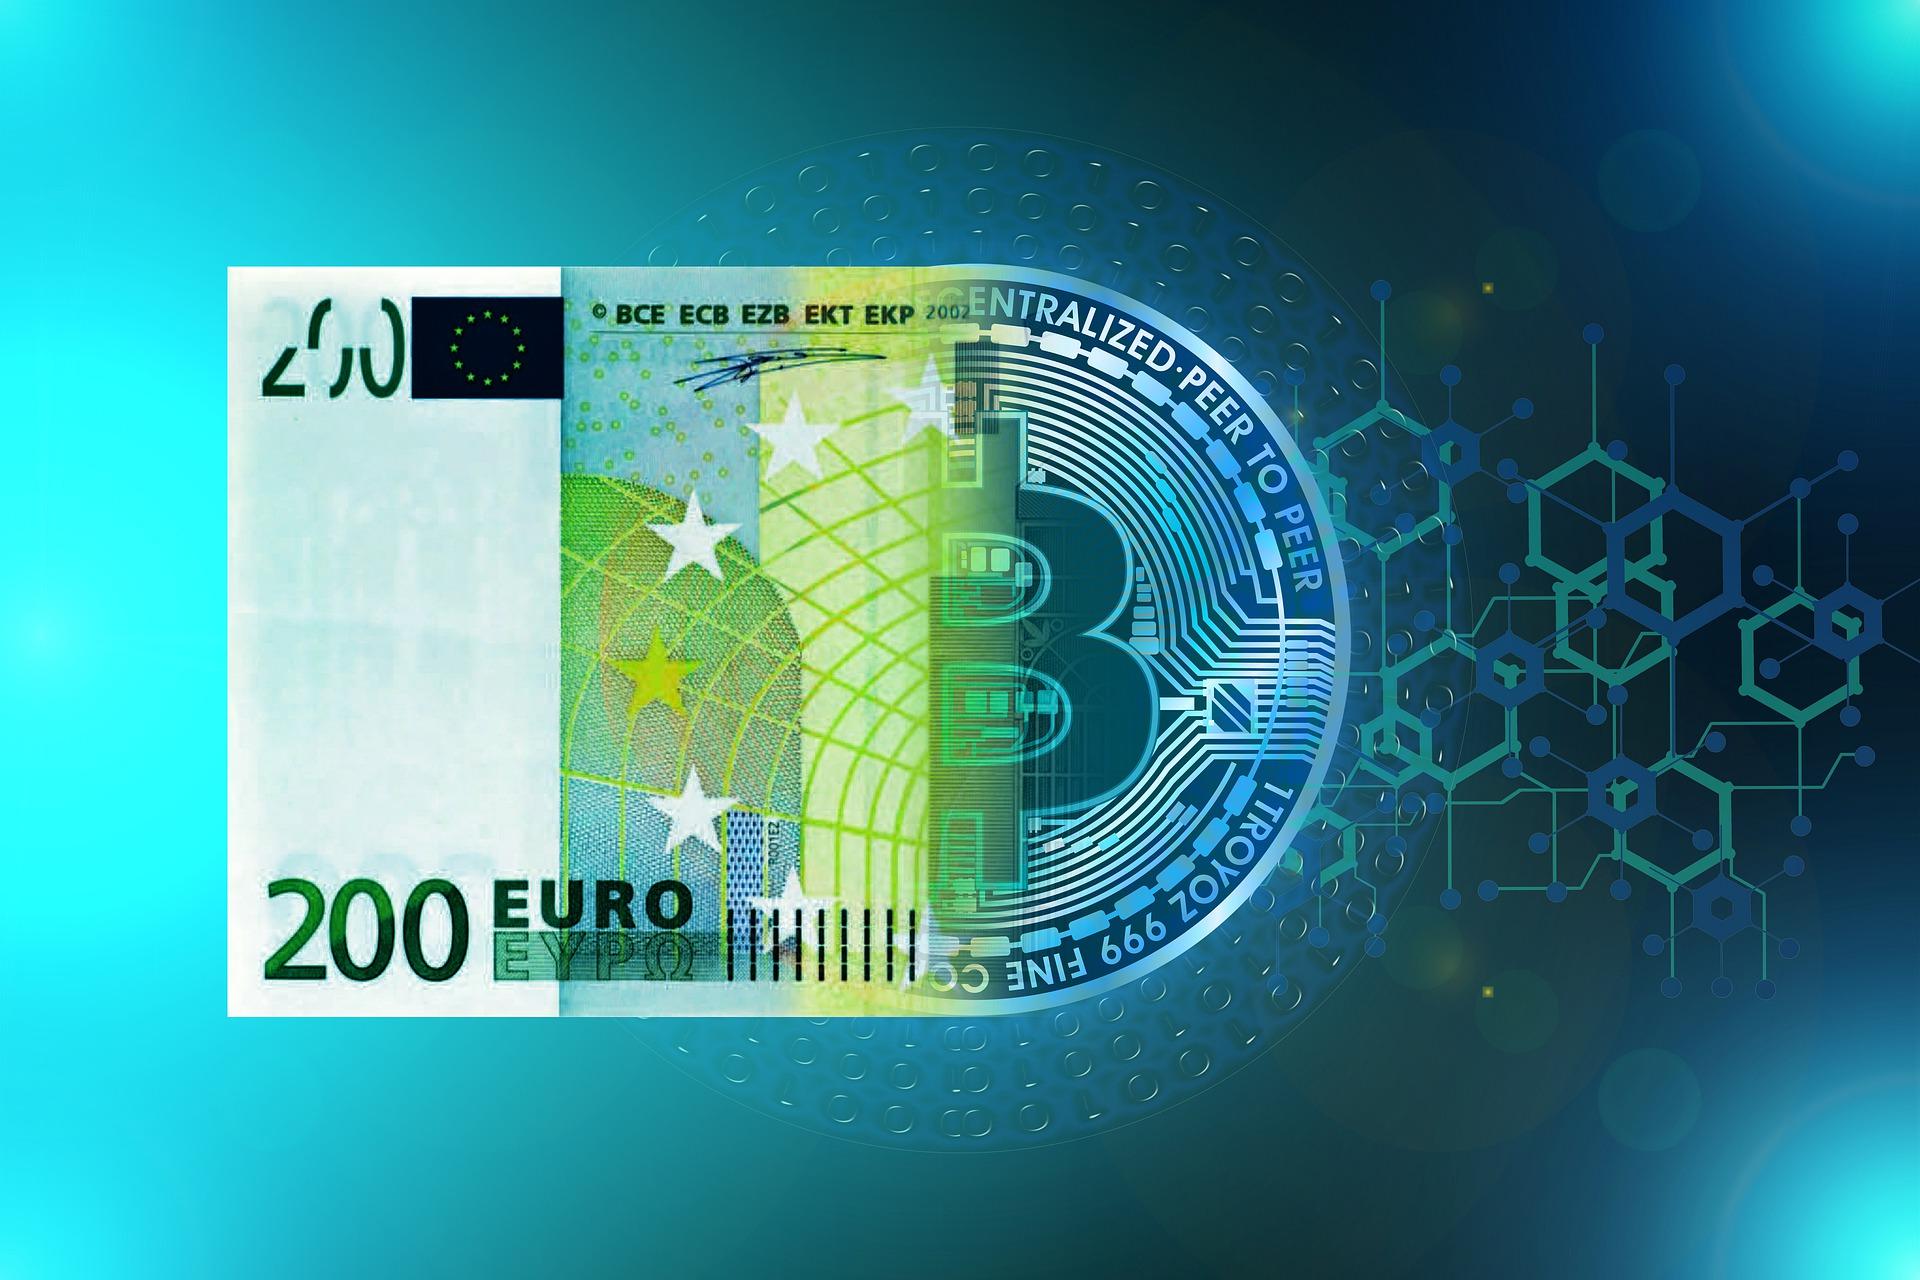 graficul rețelei Bitcoin)